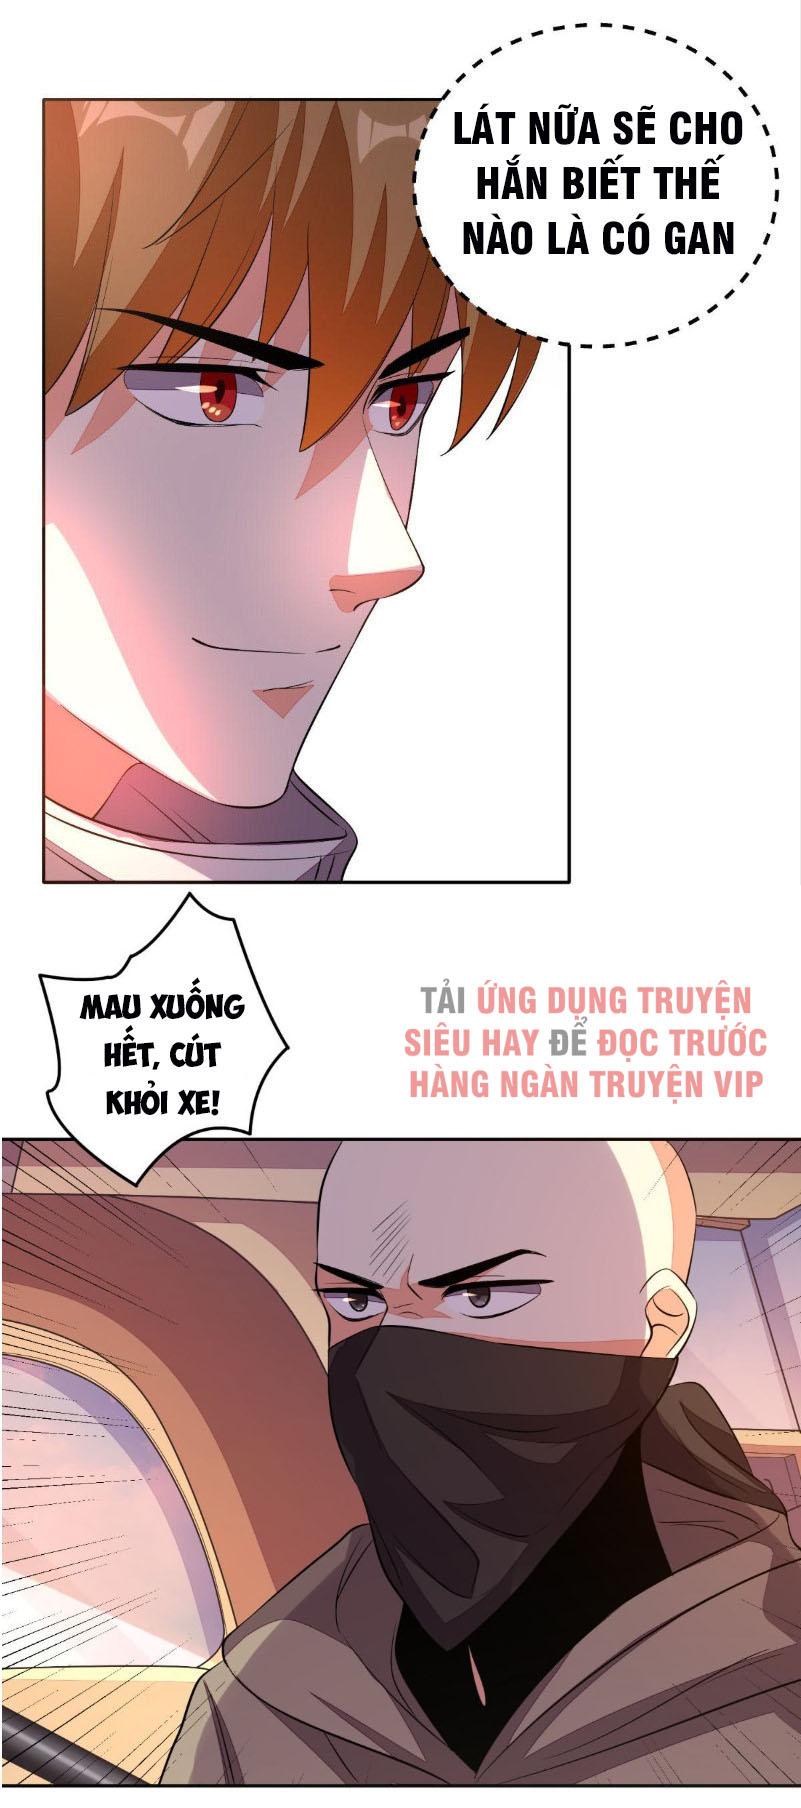 Wechat Siêu Cấp chap 24 - Trang 19